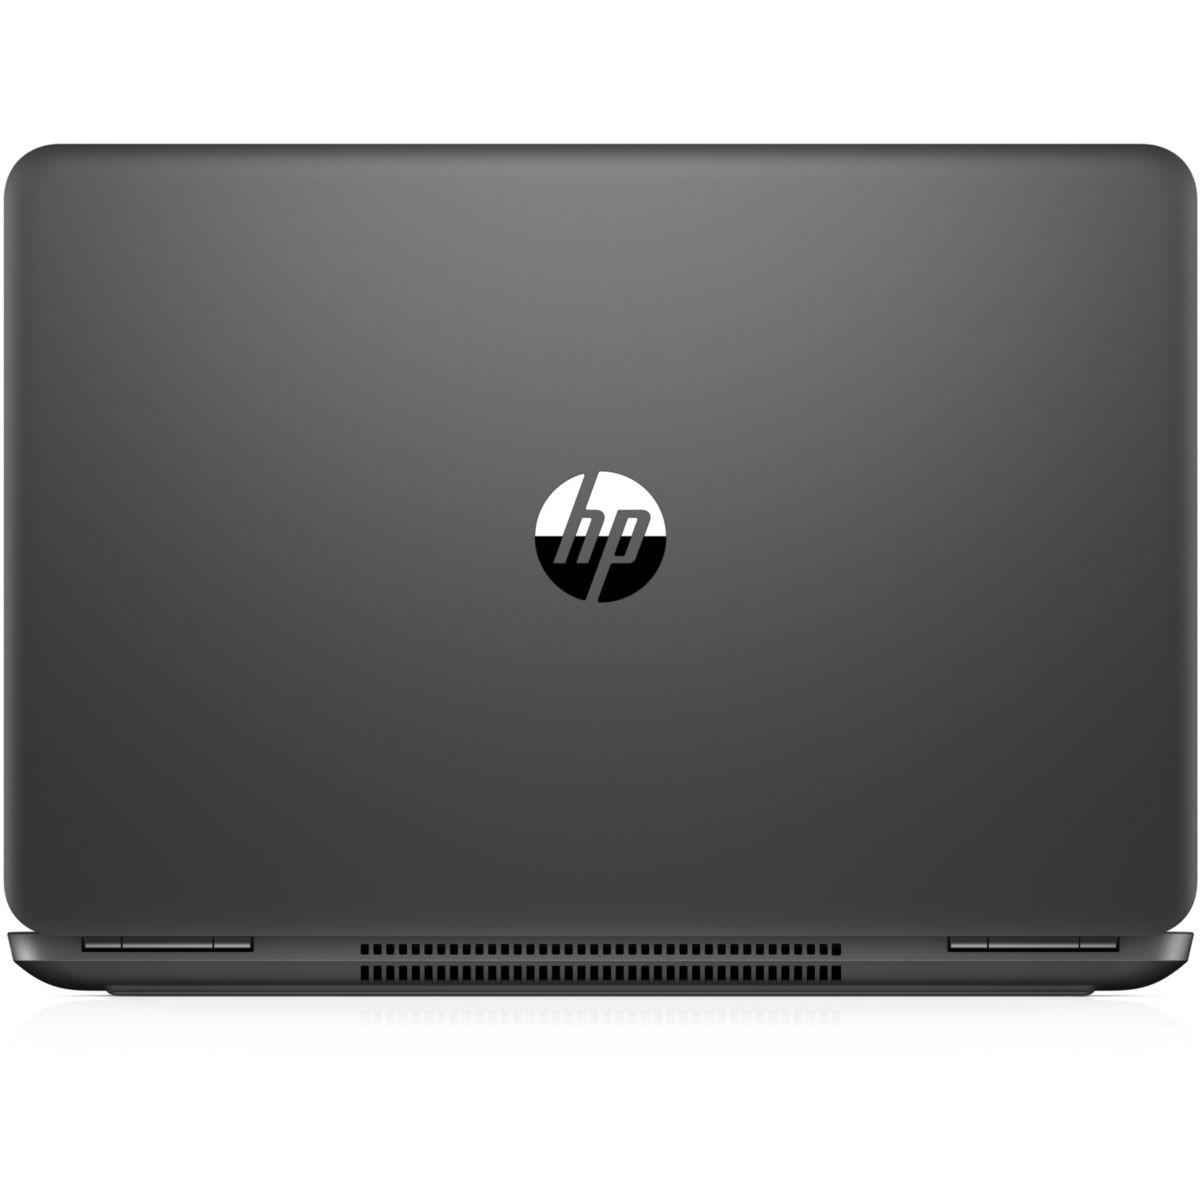 "HP Pavilion 15-bc307nf 15"" Core i5 2,5 GHz - HDD 1 TB - 6GB - NVIDIA GeForce GTX 950M AZERTY - Frans"